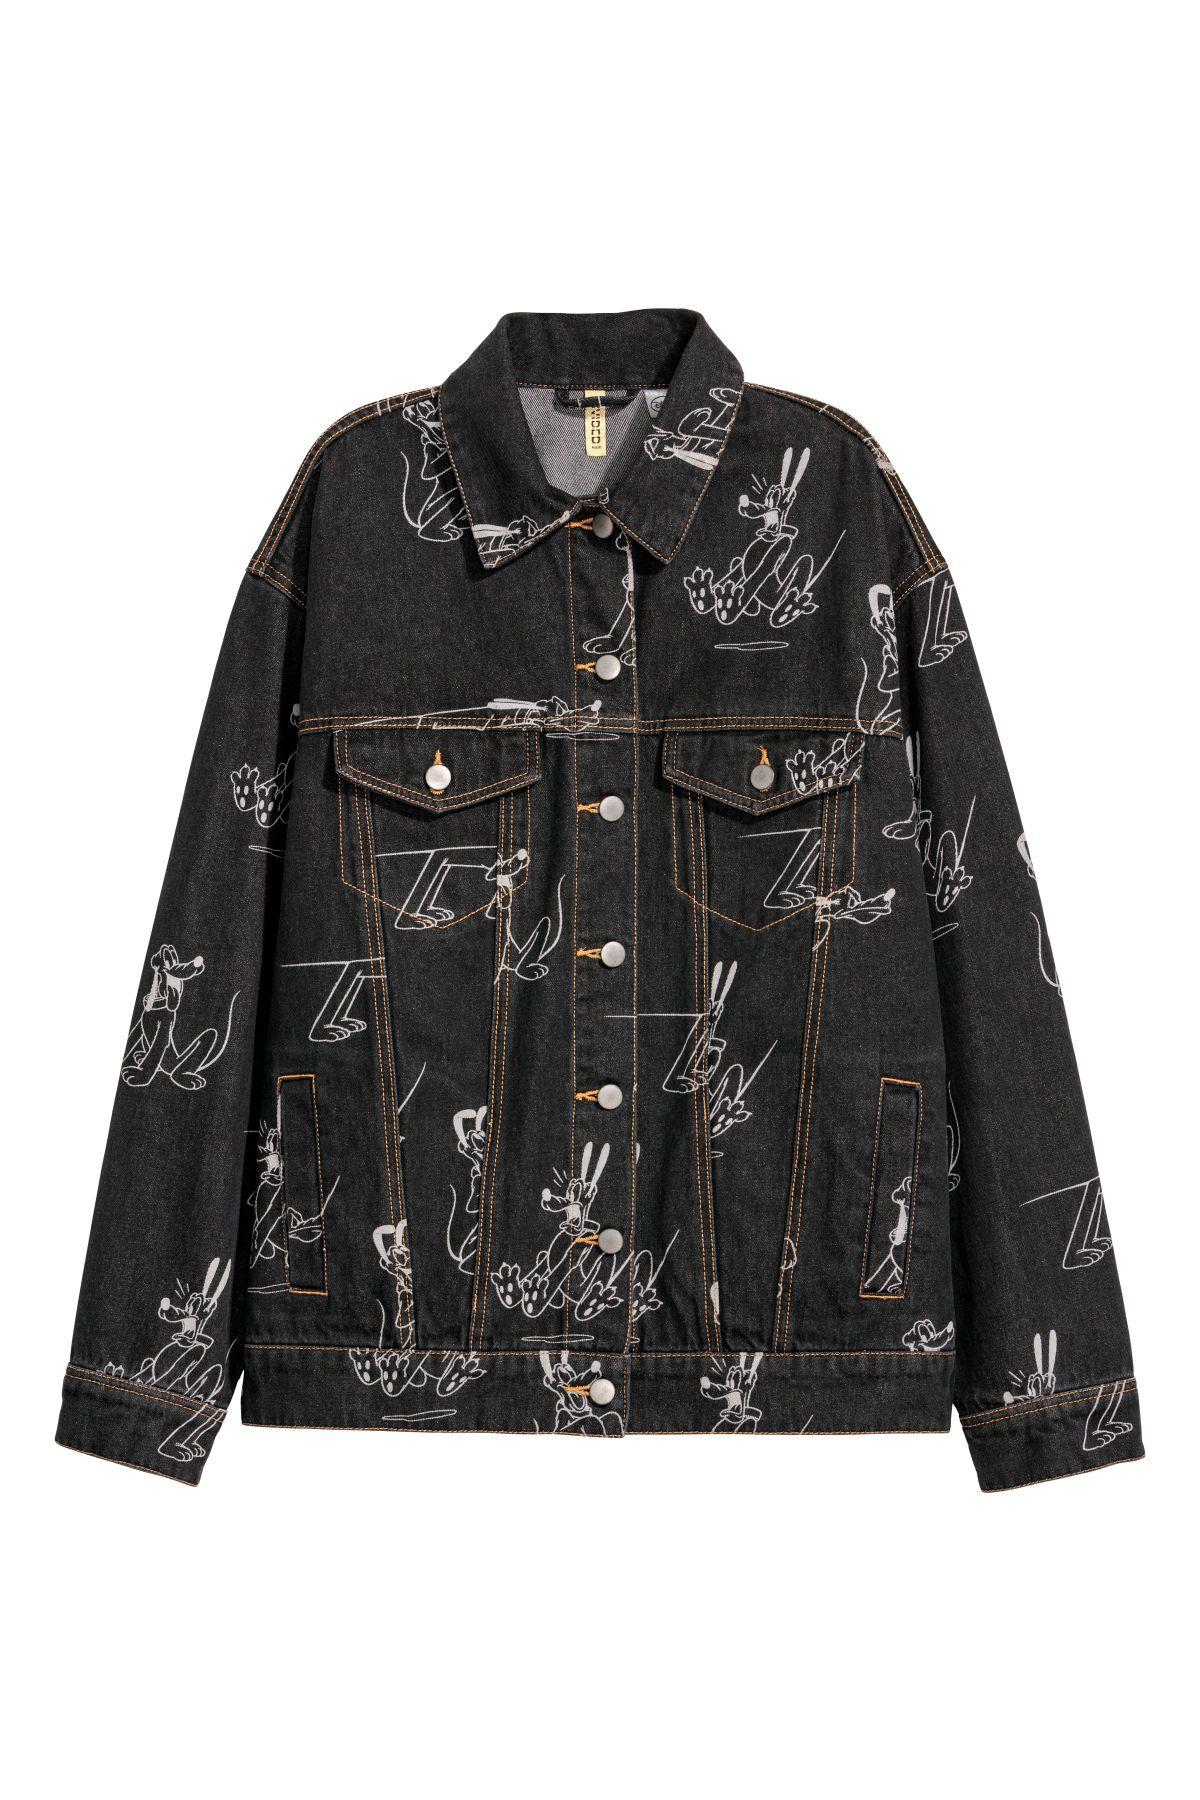 #PopbelaOOTD: I Love Summer! Intip Koleksi Jaket Musim Panas Ini Yuk